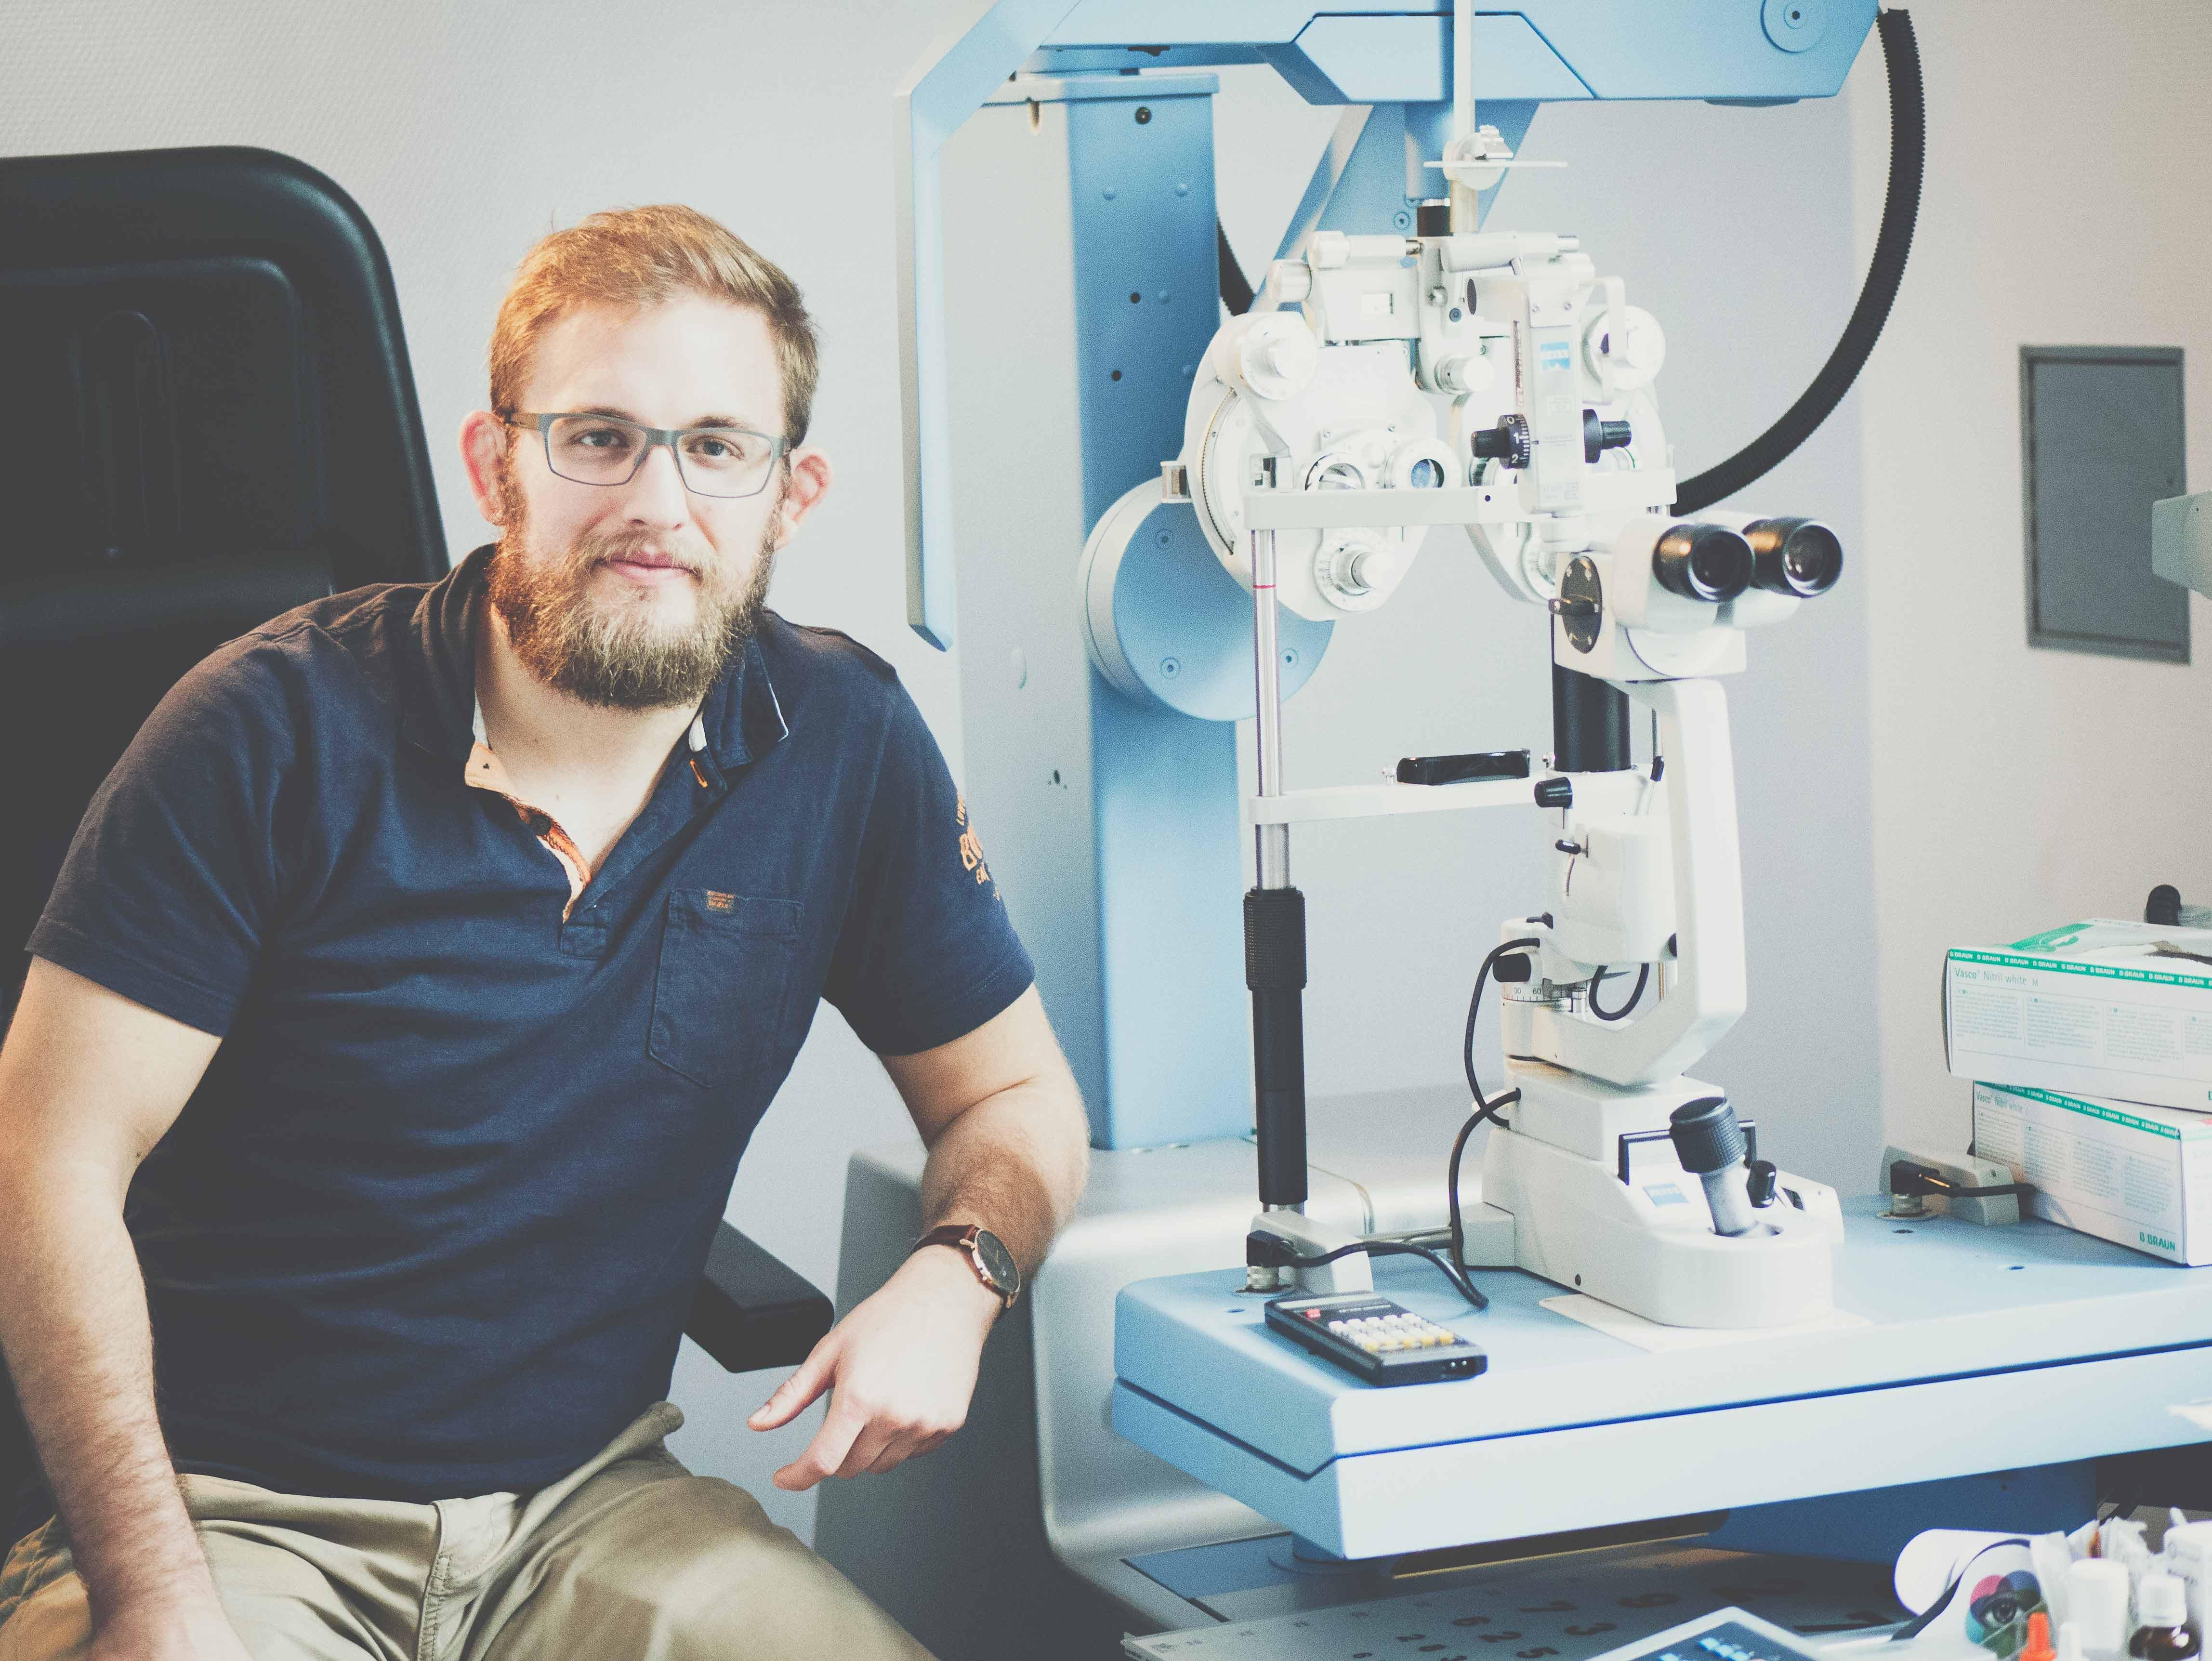 Gero Mayer | Der Augenoptikermeister